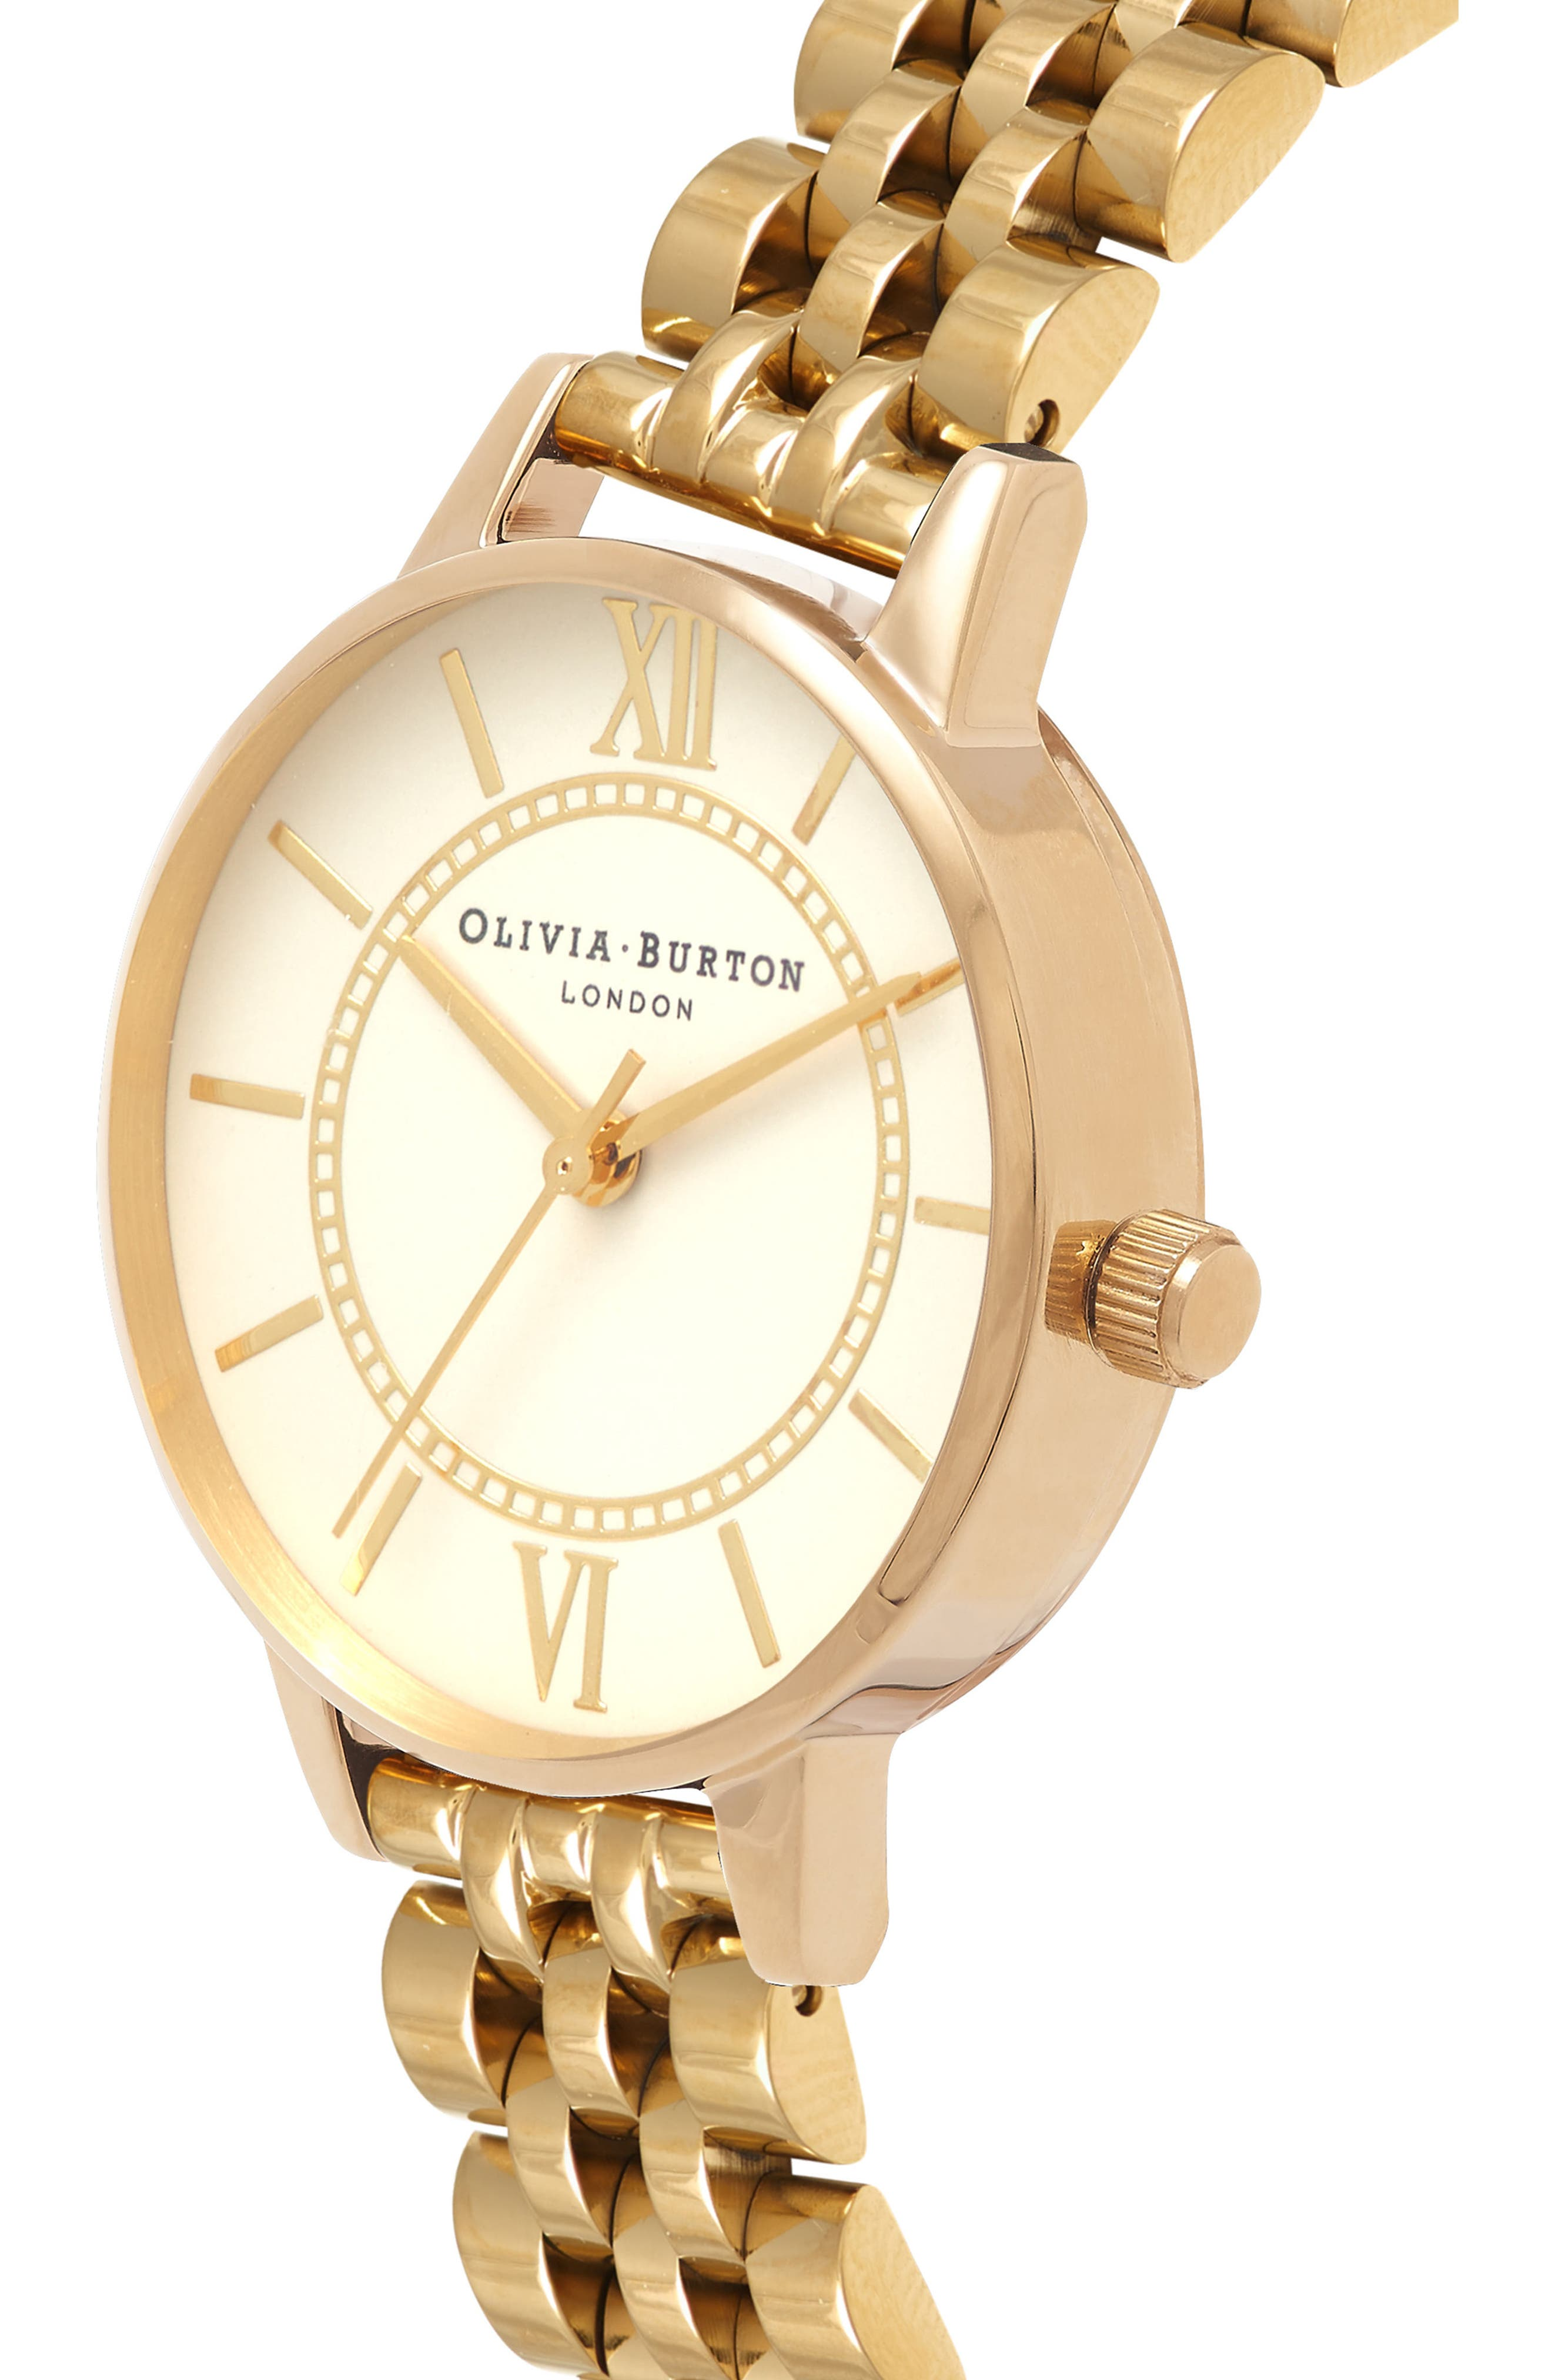 OLIVIA BURTON, Wonderland Bracelet Watch, 30mm, Alternate thumbnail 4, color, GOLD/ NUDE/ GOLD